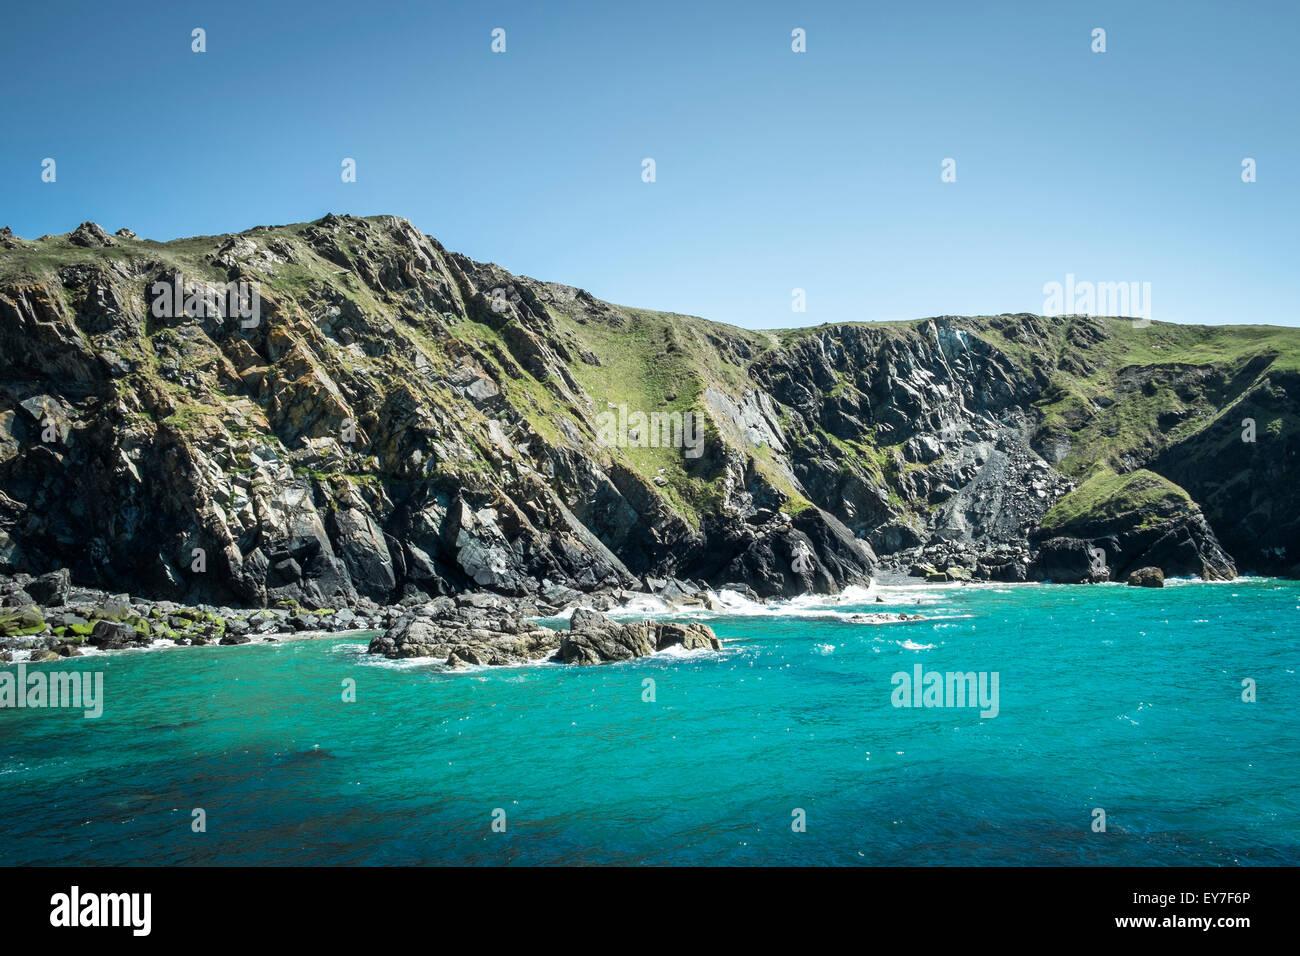 Headland and cliffs at Mullion Cove, Lizard Peninsula, Cornwall, England, UK - Stock Image